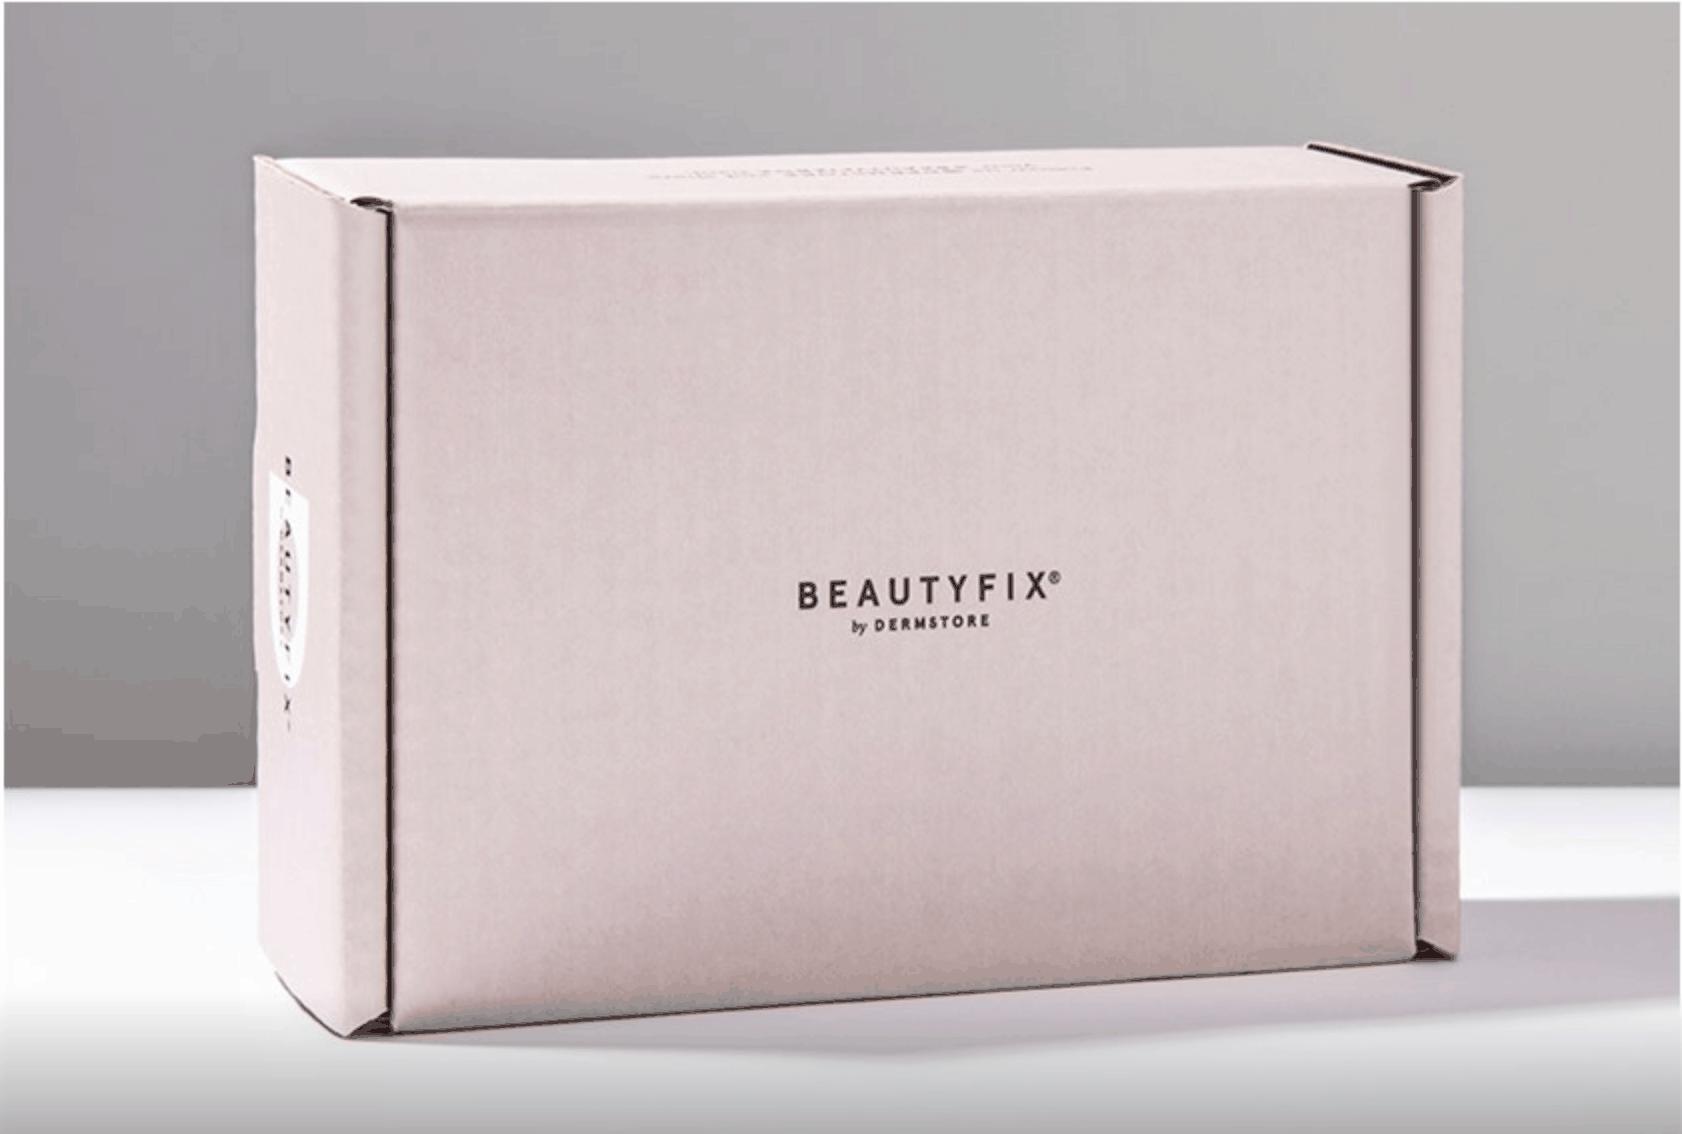 Beautyfix September 2019 Available Now Full Spoilers